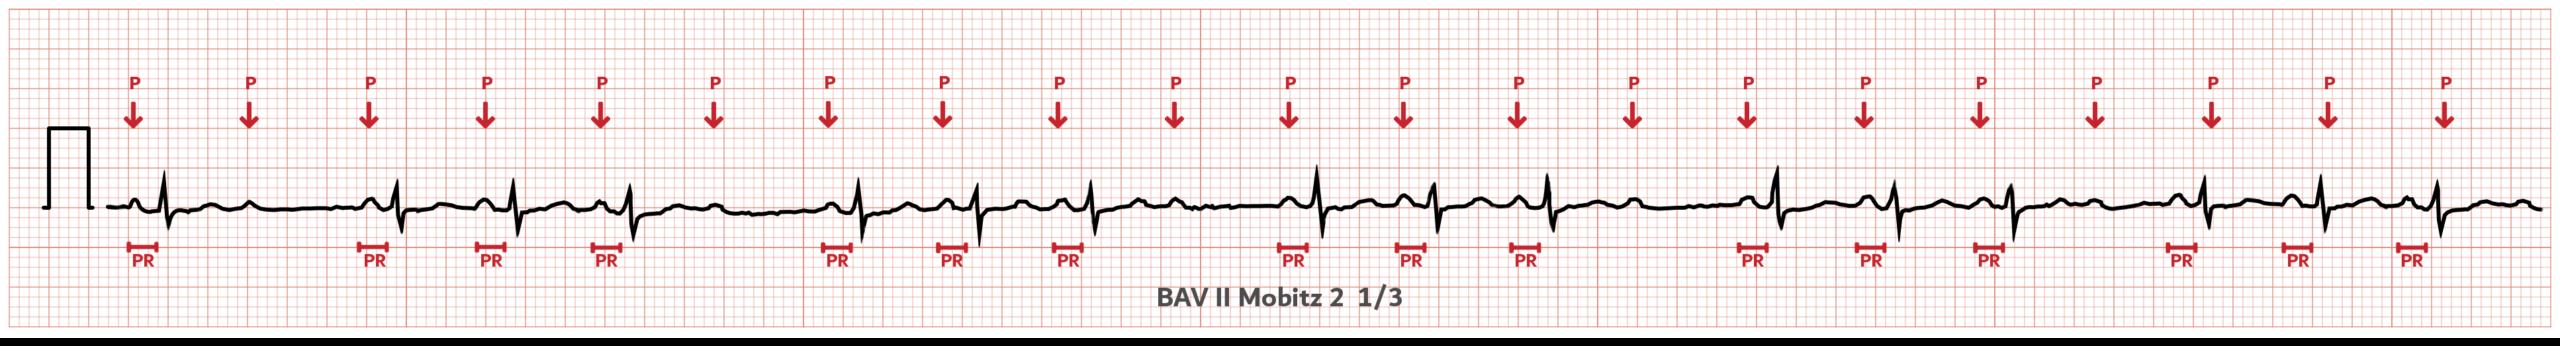 BAV2 - Mobitz 2 - ECG